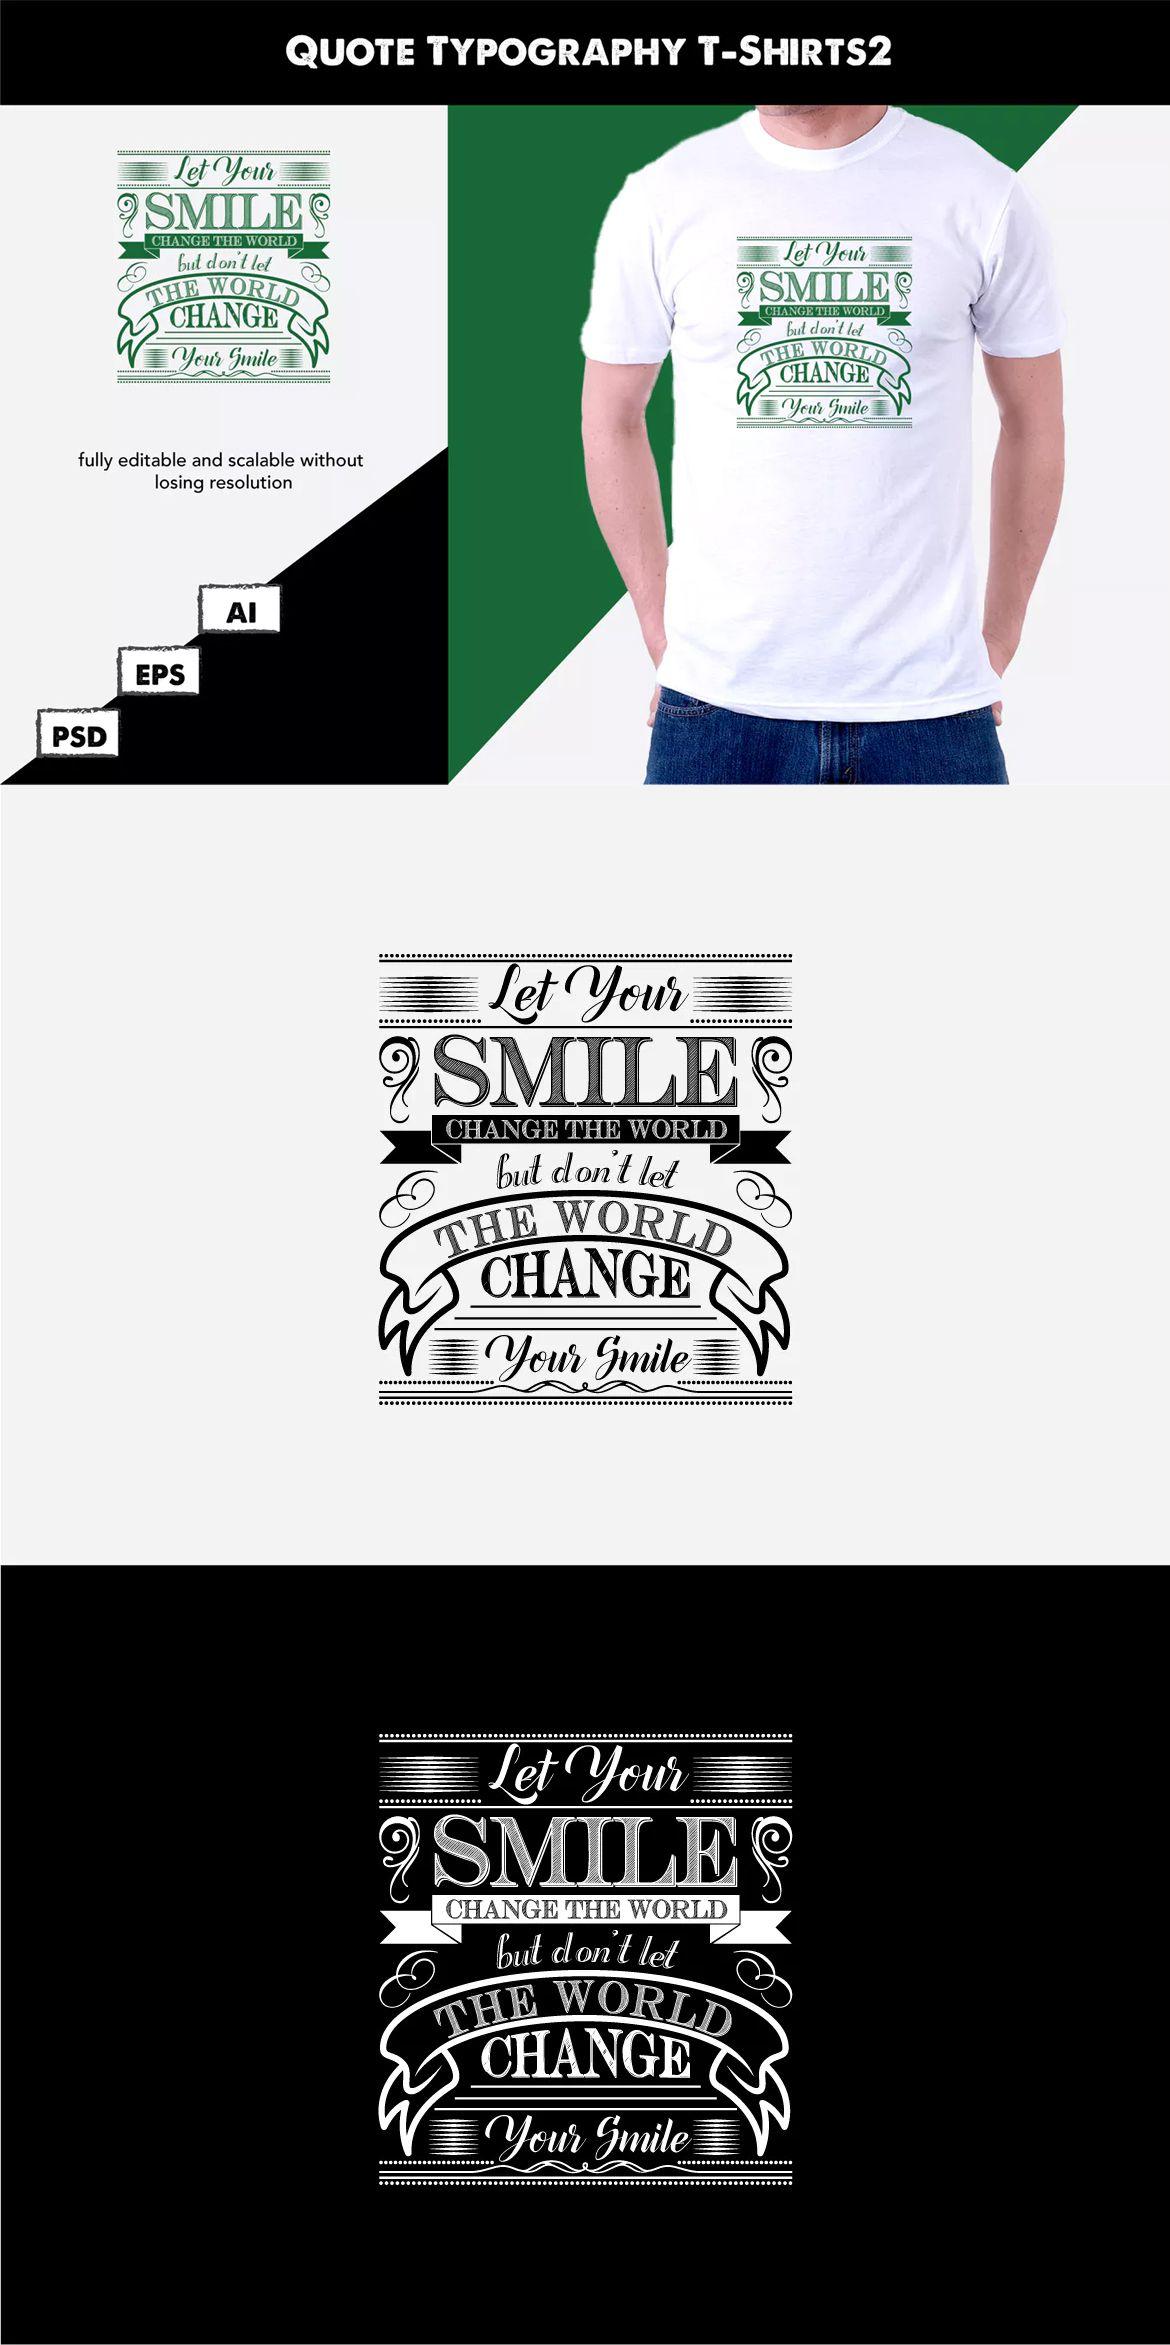 fe2869e8 Quote Typography T-Shirt2 AI, EPS, PSD #unlimiteddownloads   T-Shirt ...